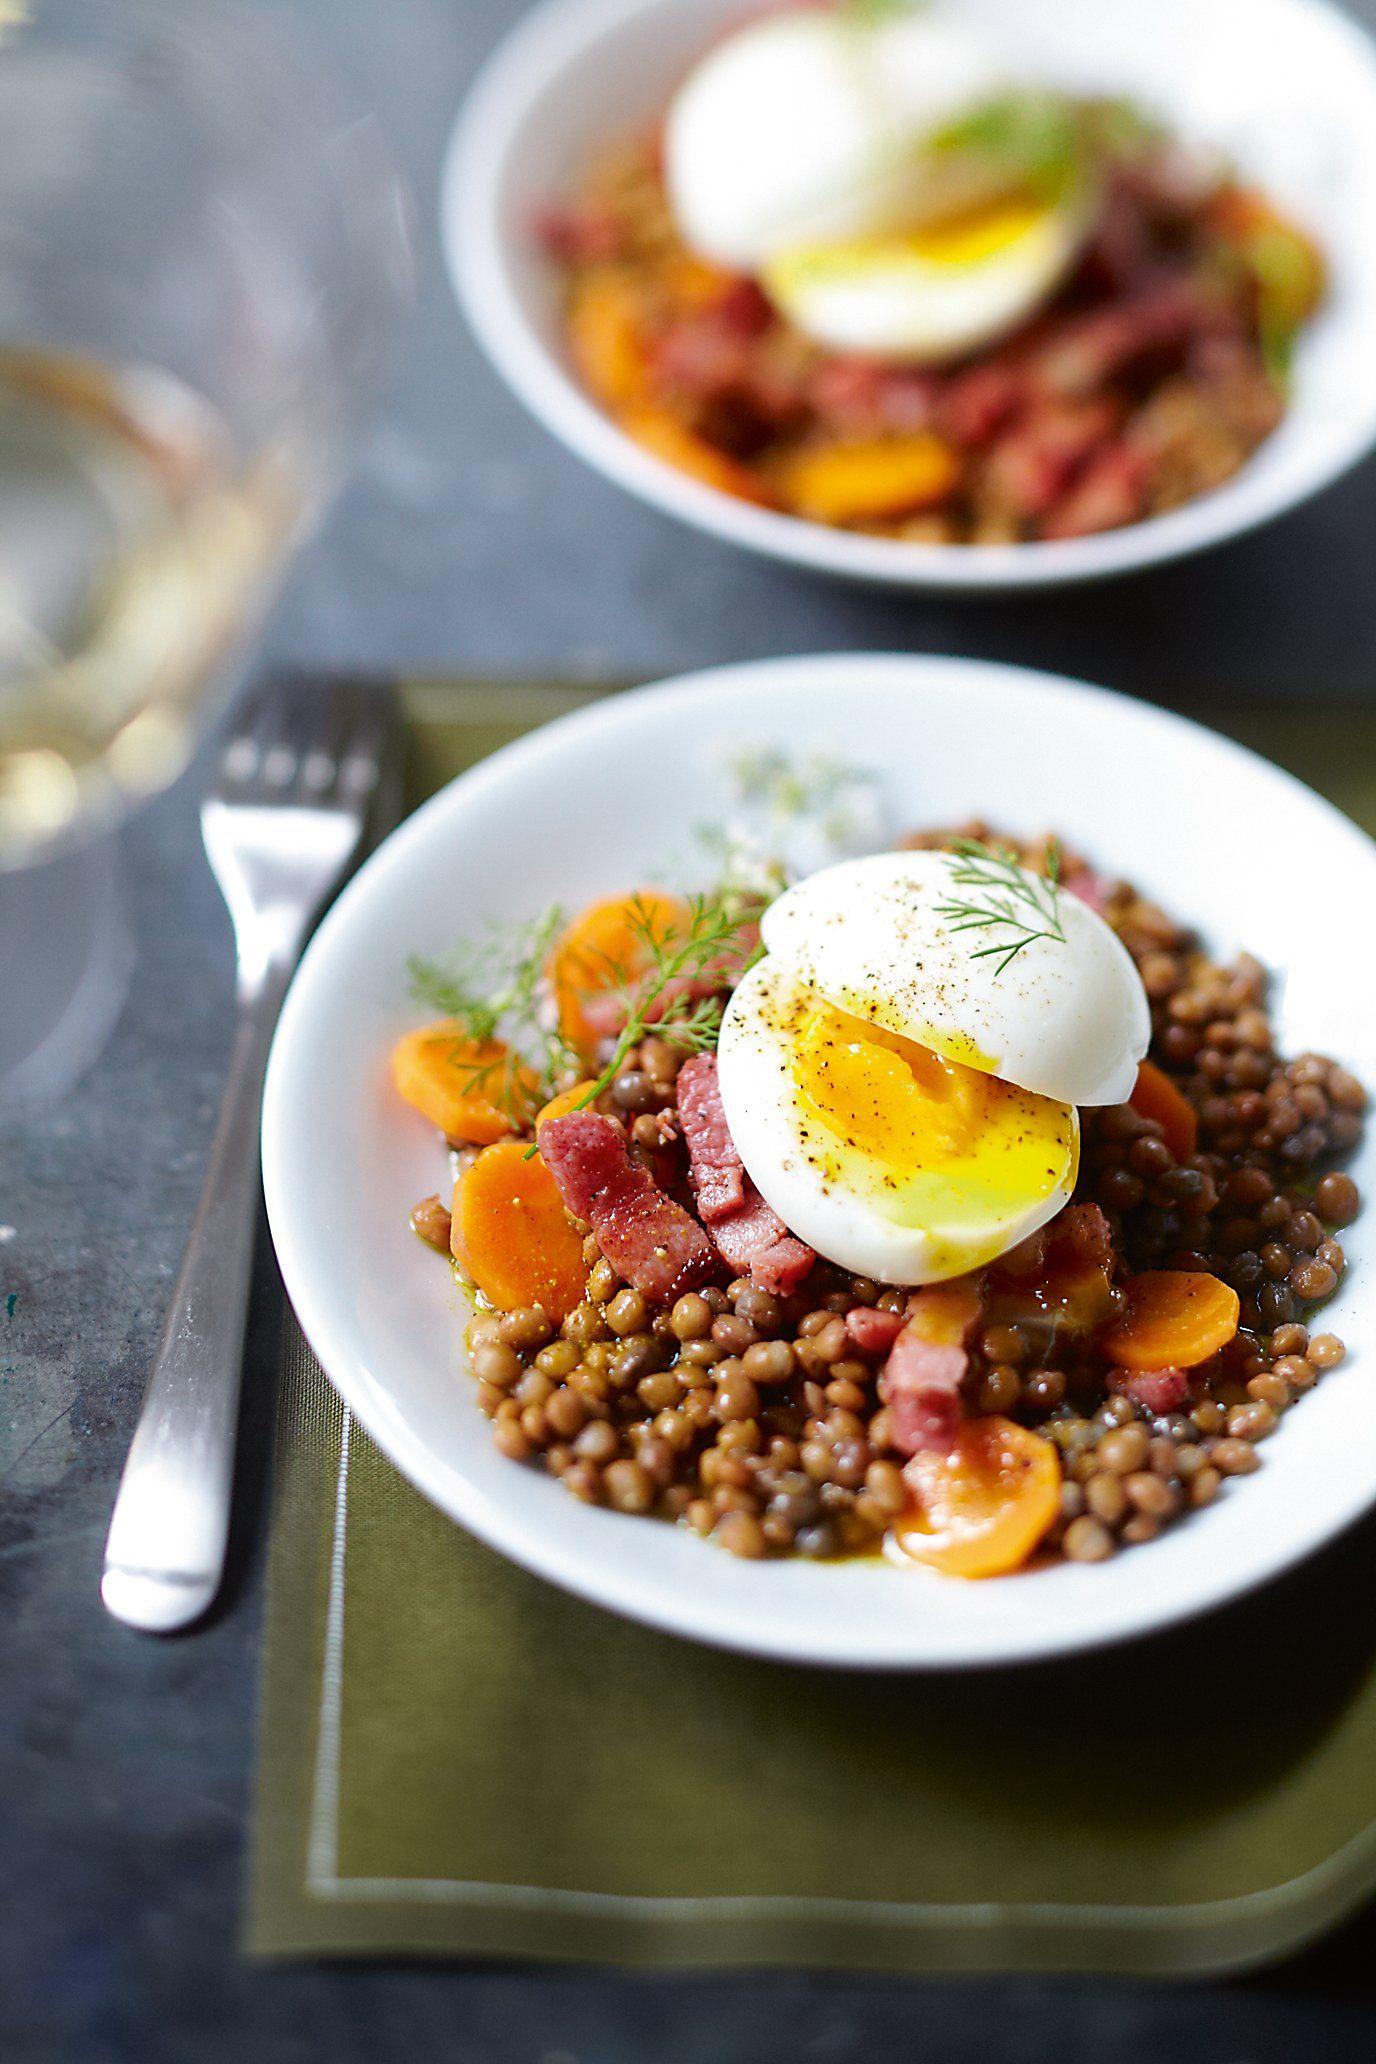 Salade De Lentilles Lardons : salade, lentilles, lardons, Salade, Lentilles, Curry,, Mollet, Lardons, Lentilles,, Curry, Cuisine